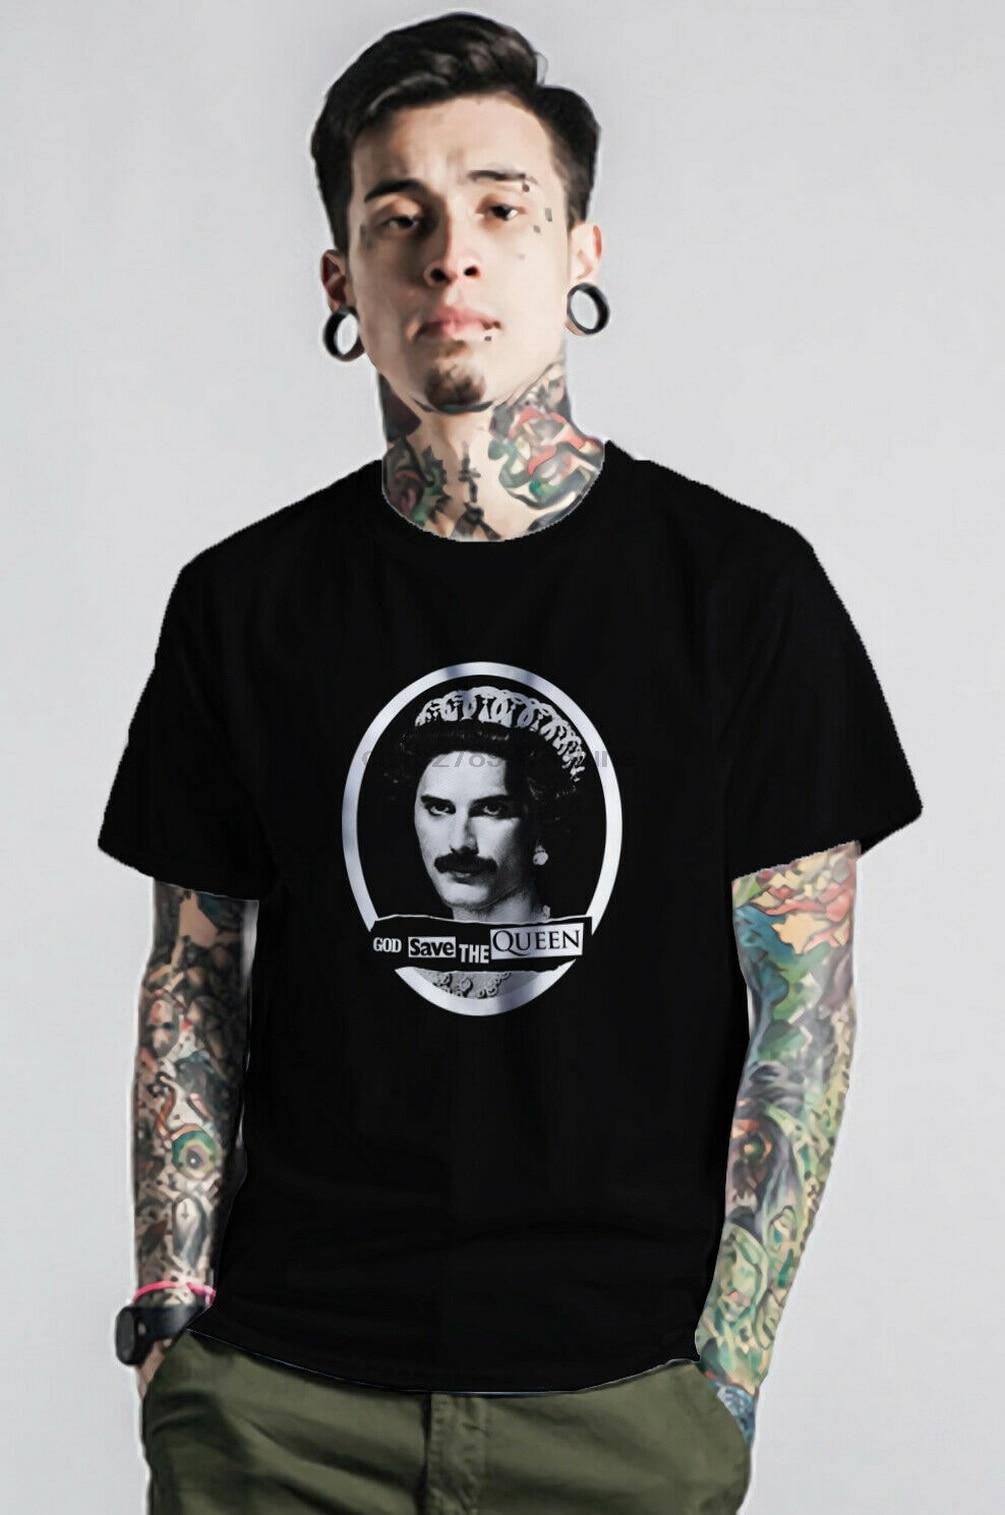 Freddie mercúrio camiseta deus salvar a rainha exclusivo roupas vintage m xl 2xl 13xl camiseta